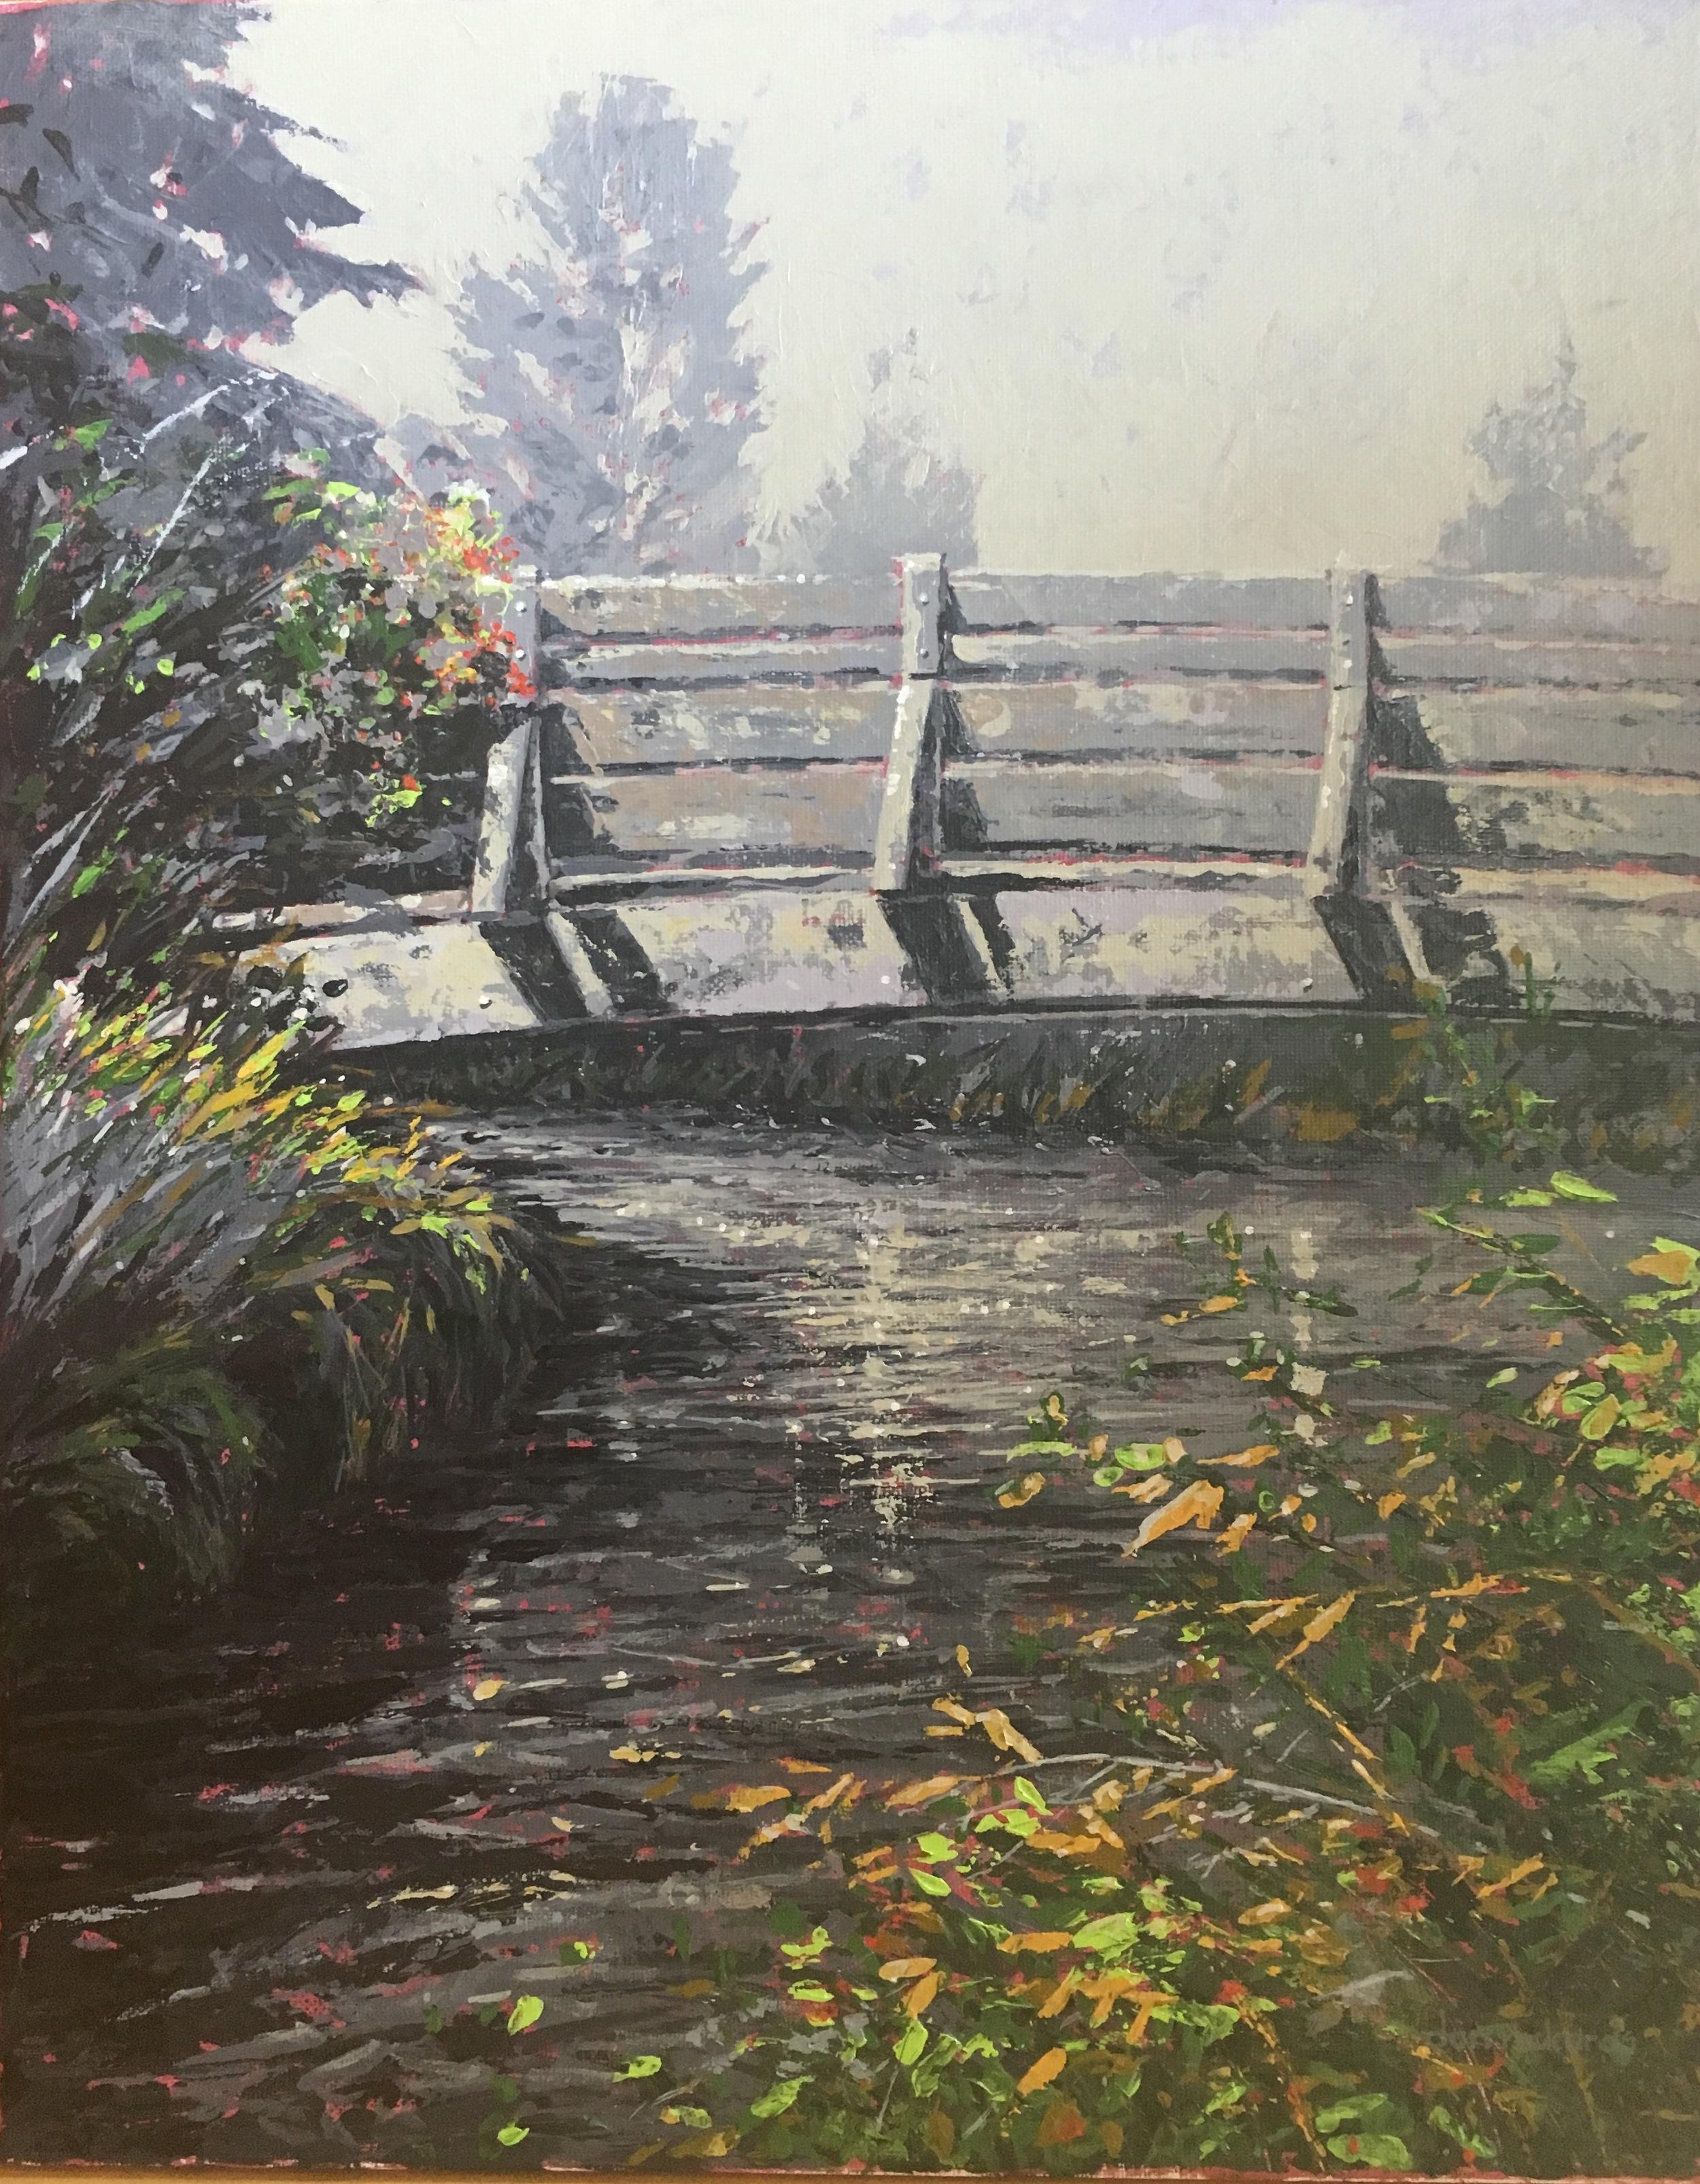 """Lake Creek Bridge"" by Dan Rickards"